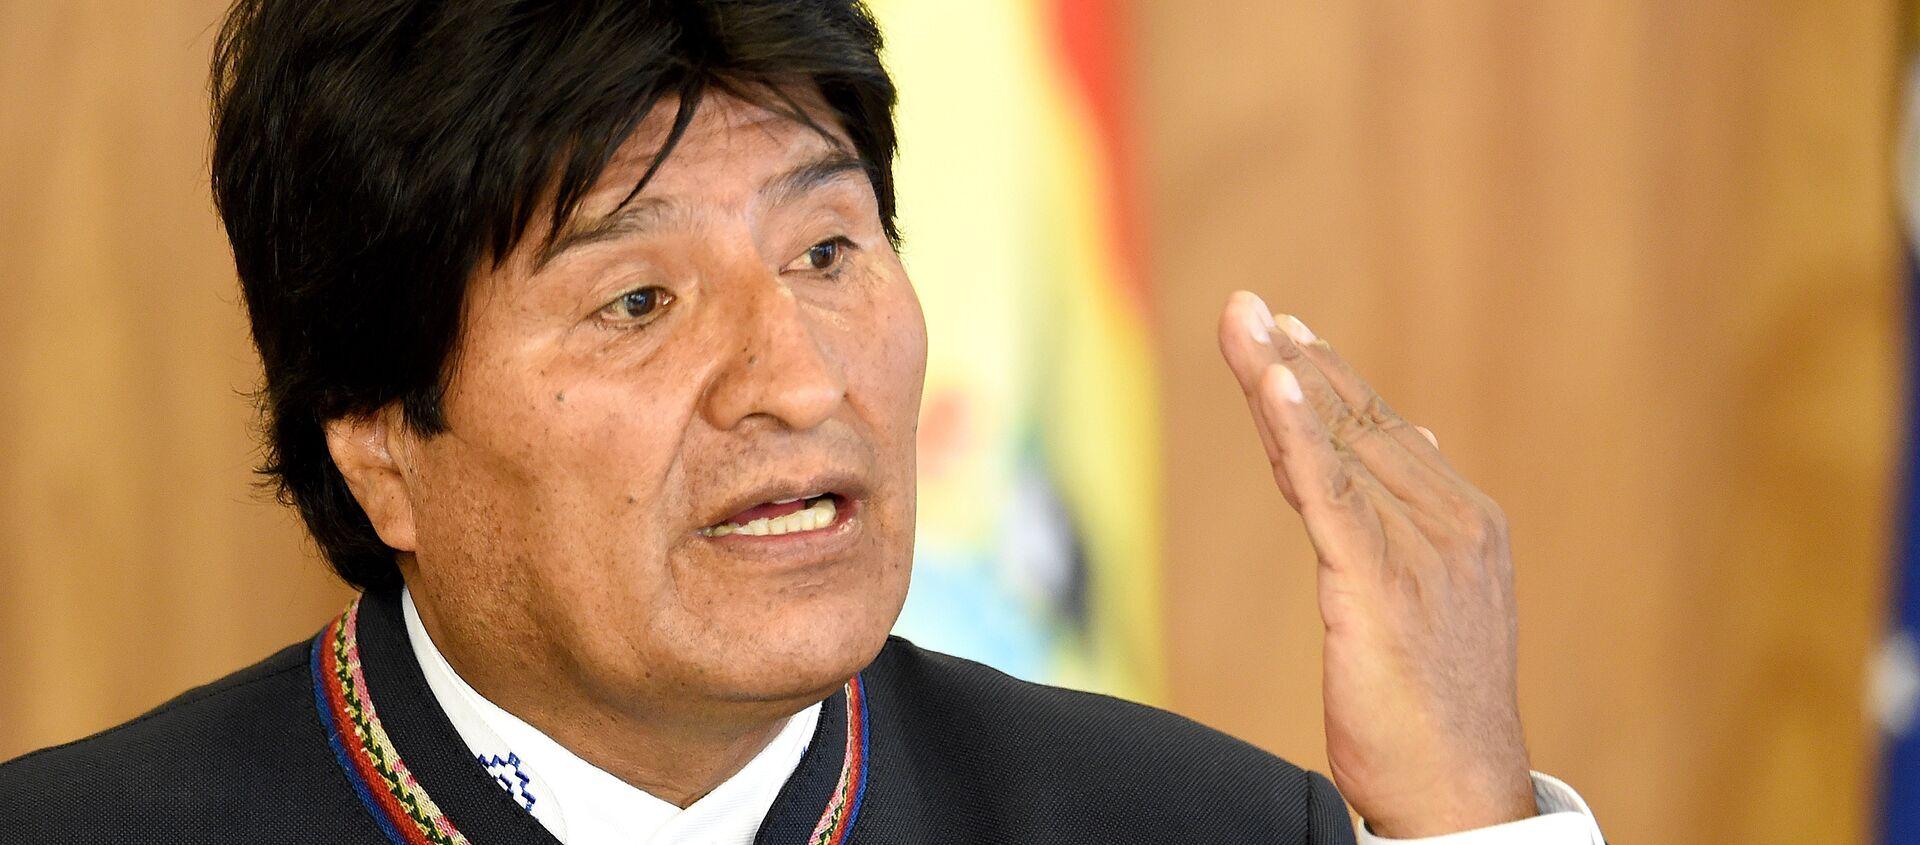 Evo Morales, expresidente de Bolivia (archivo) - Sputnik Mundo, 1920, 12.10.2020